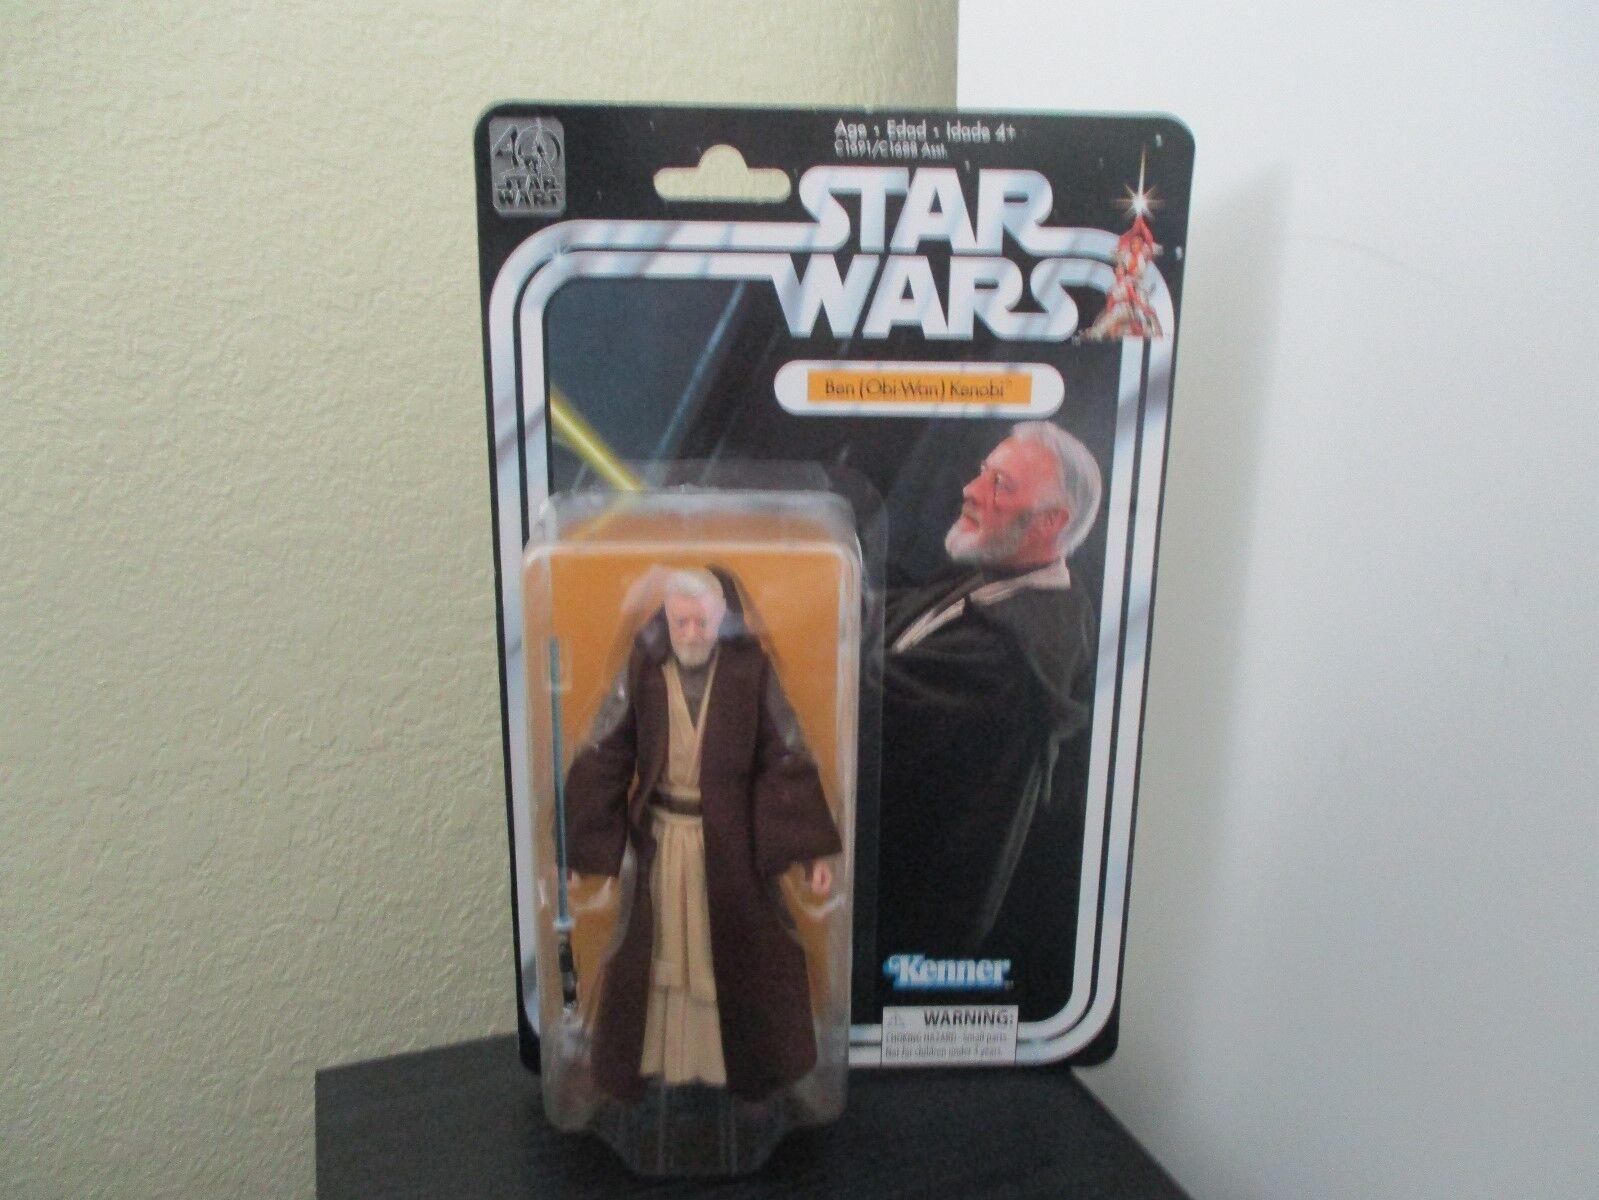 Star Wars 40th Anniversary Ben Obi-Wan Kenobi 6 inch New   Never been opened